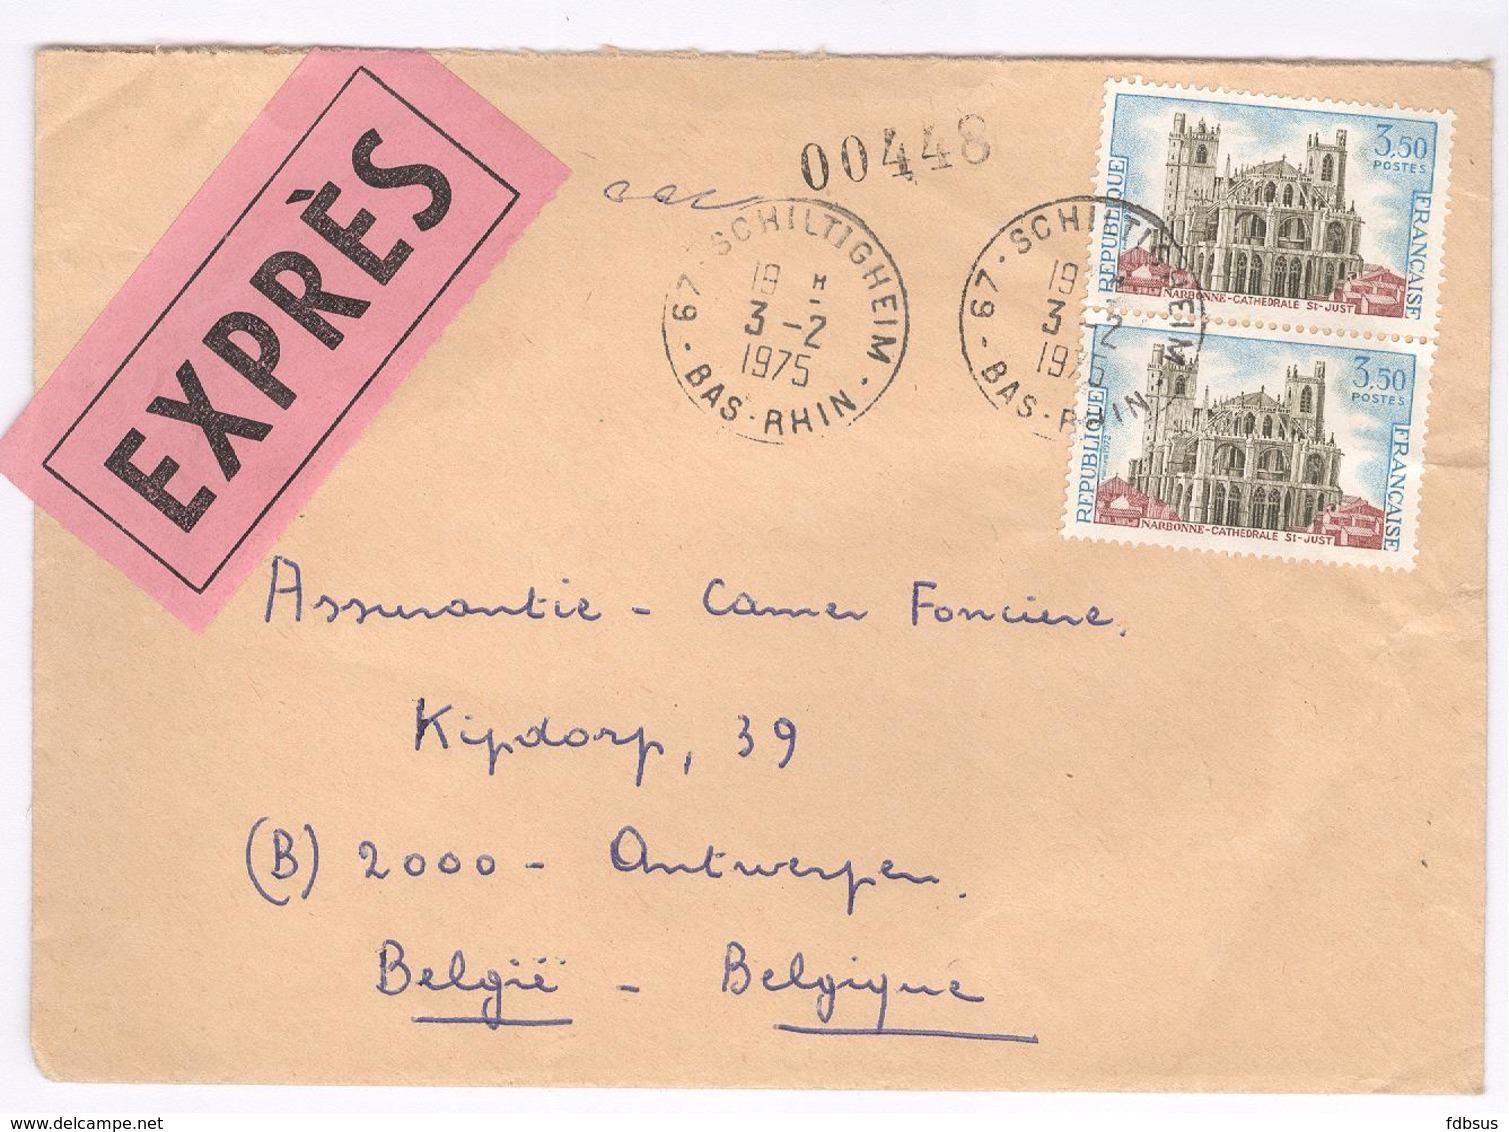 1975 Schiltigheim  Exprès Envelope To Camer Assurance Antwerp - Timbres Narbonne - France